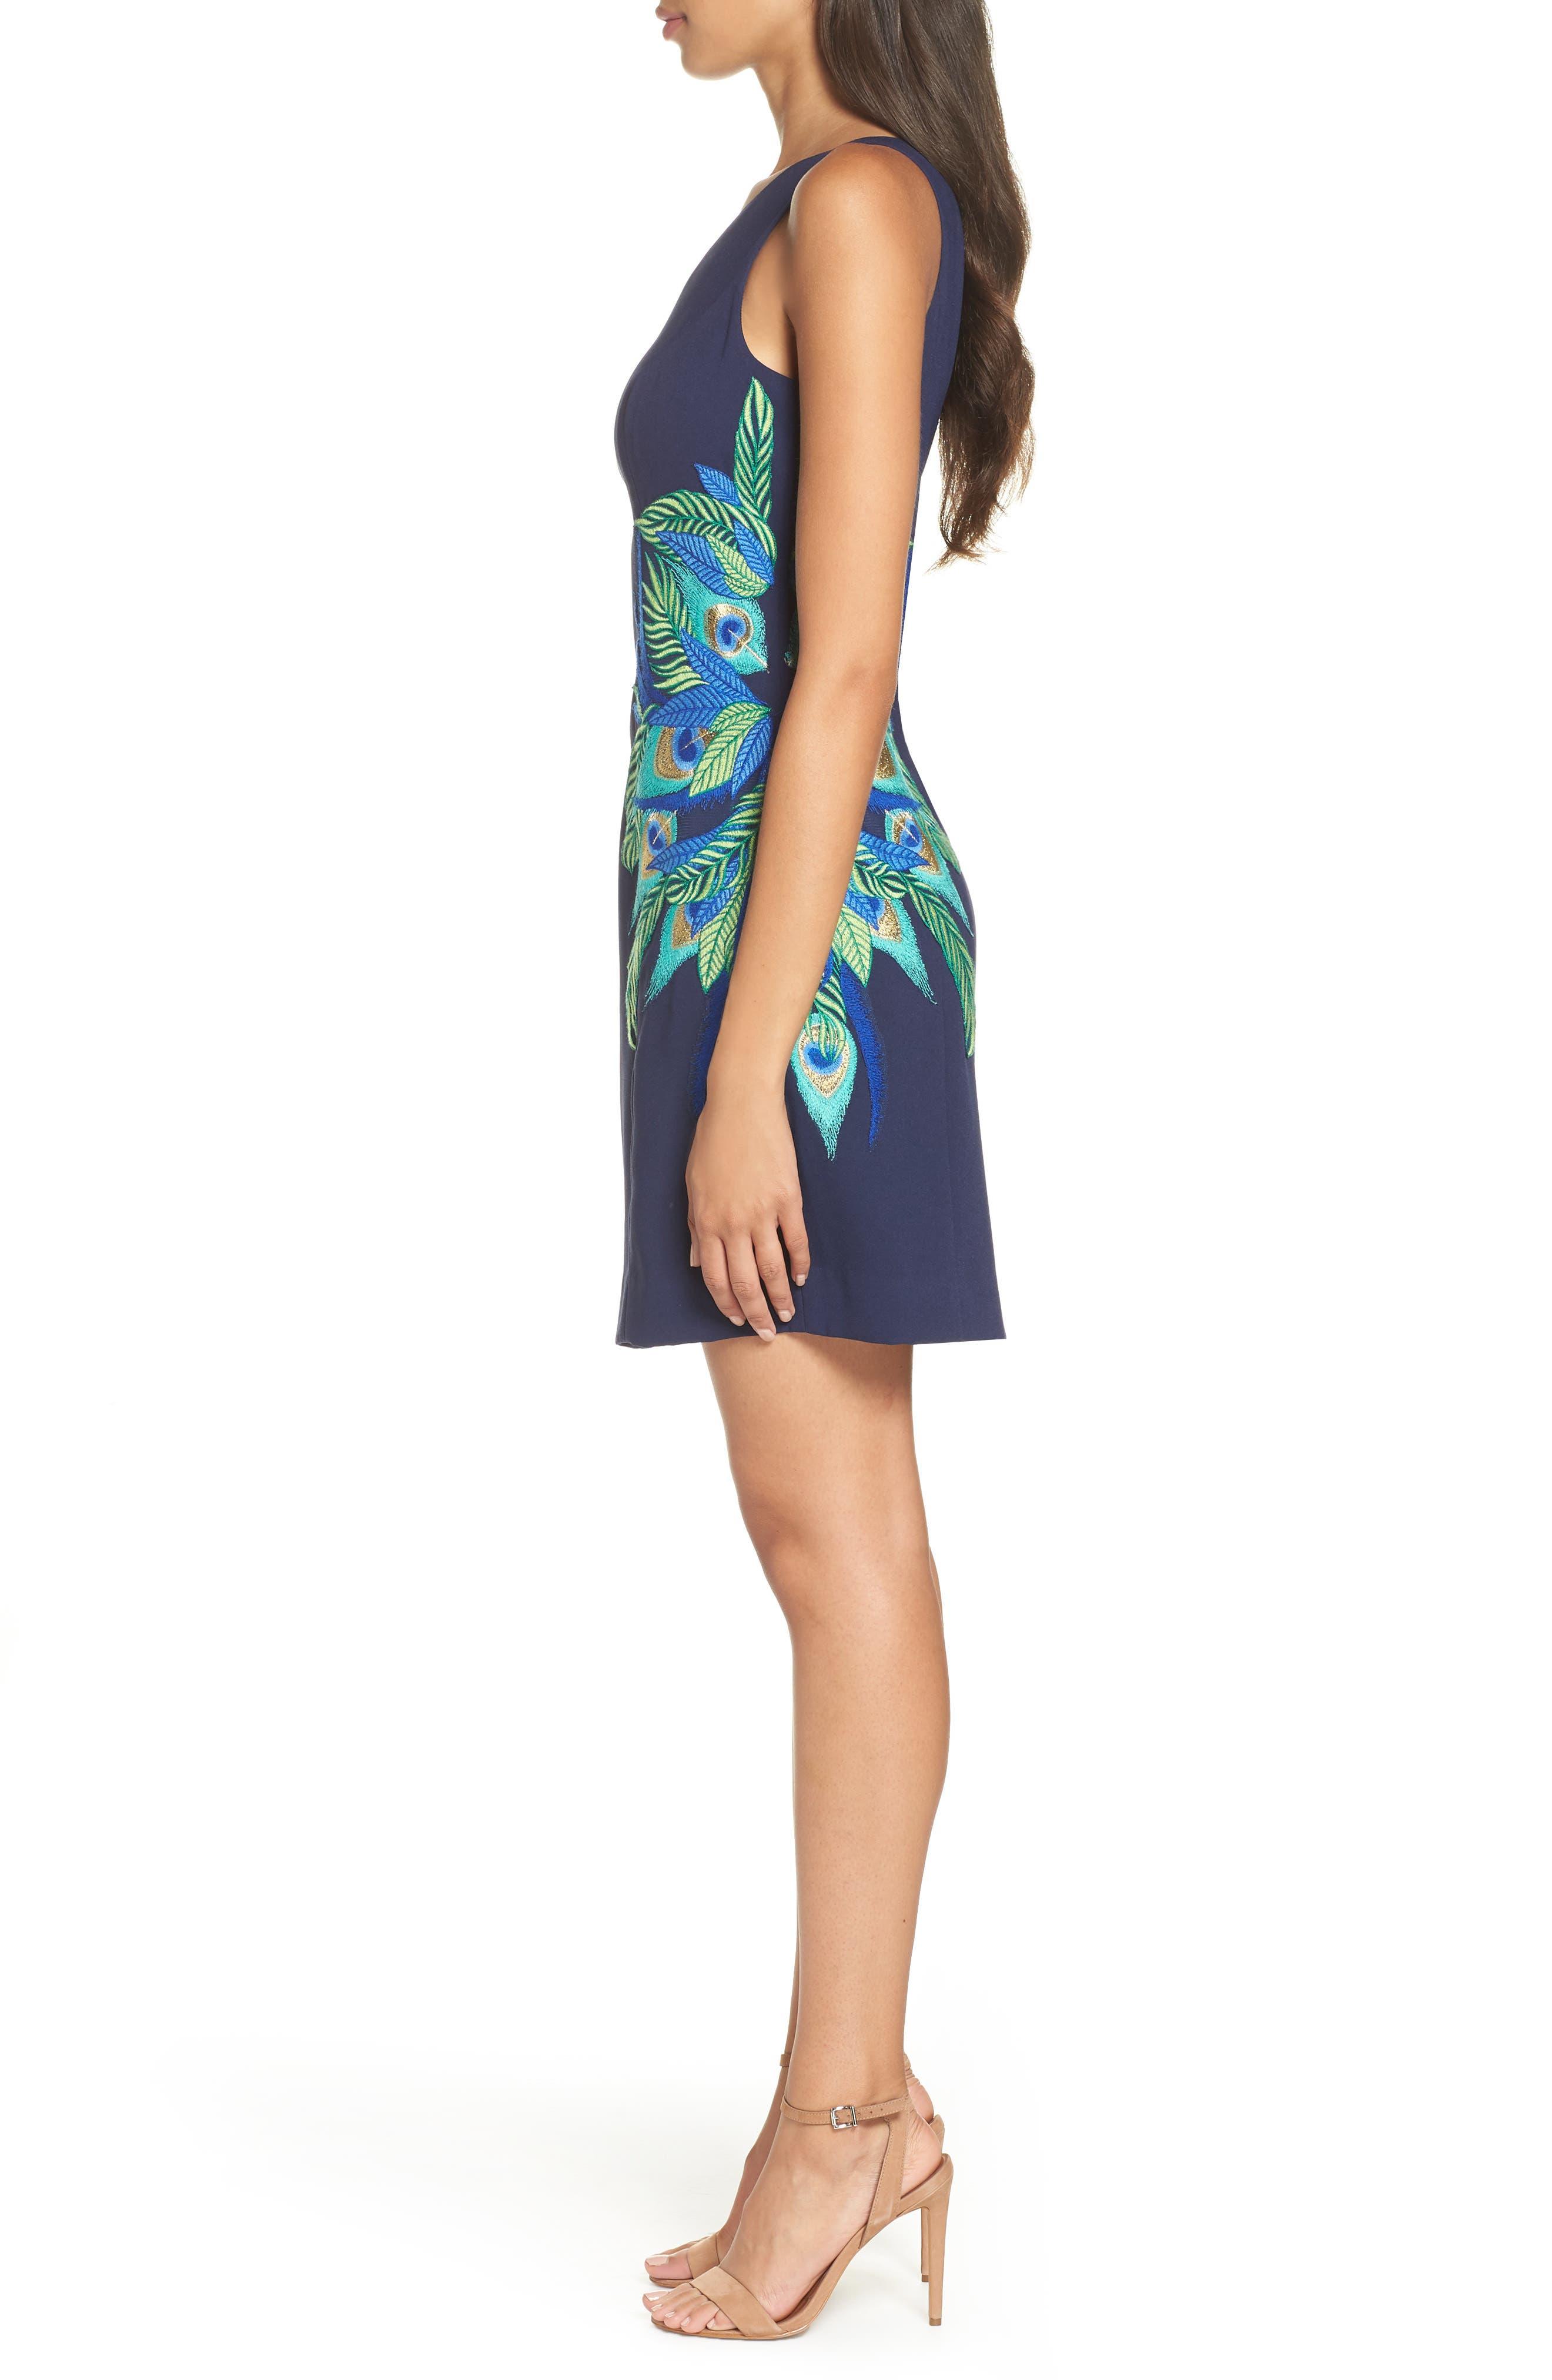 Lily Pulitzer<sup>®</sup> Jamie One-Shoulder Dress,                             Alternate thumbnail 3, color,                             TRUE NAVY